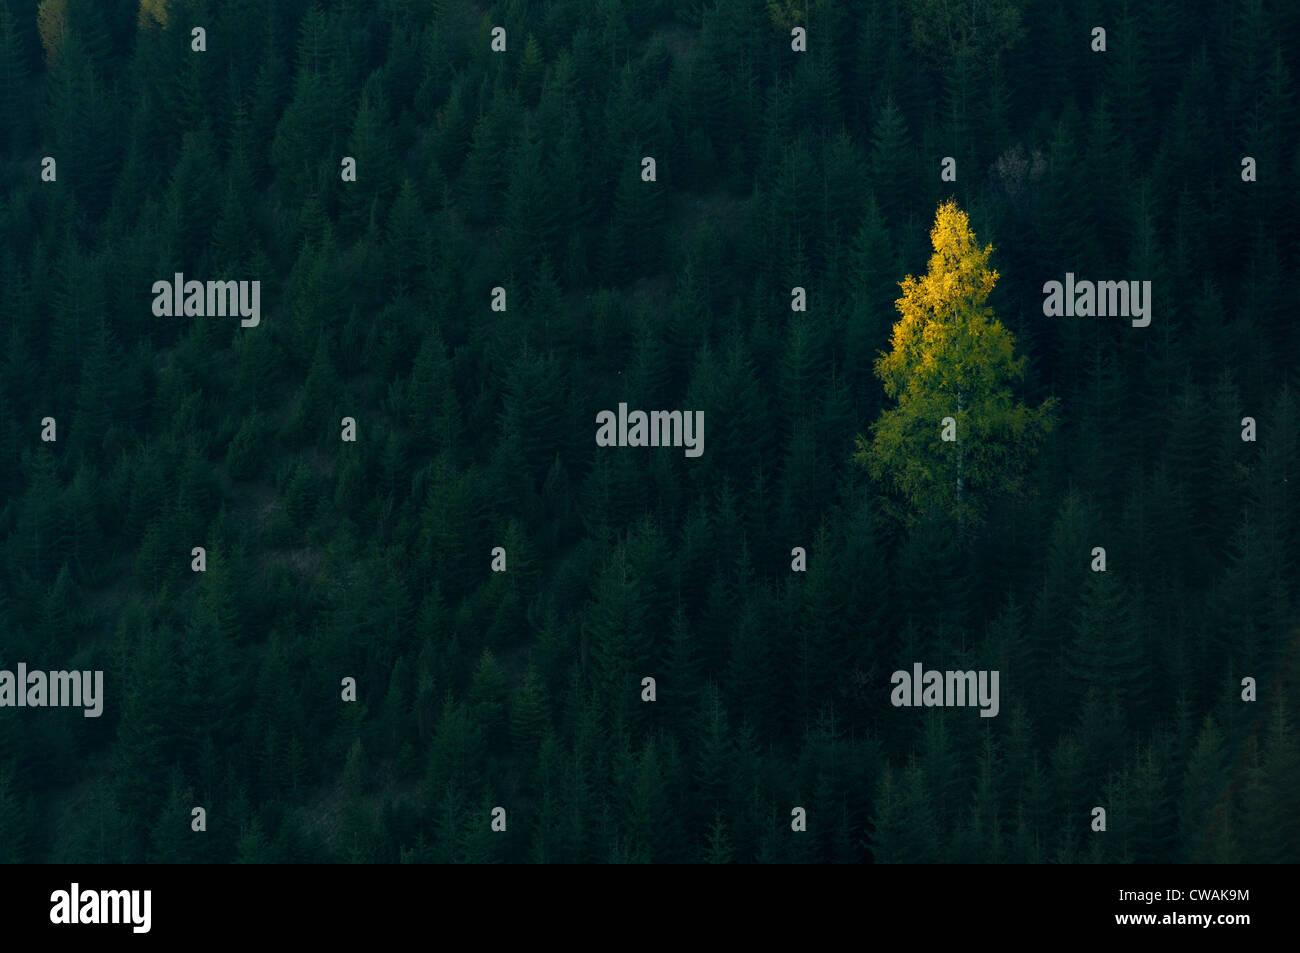 One tree illuminated in forest, Krasnik village area, Carpathian Mountains, Ivano-Frankivsk region, Ukraine - Stock Image